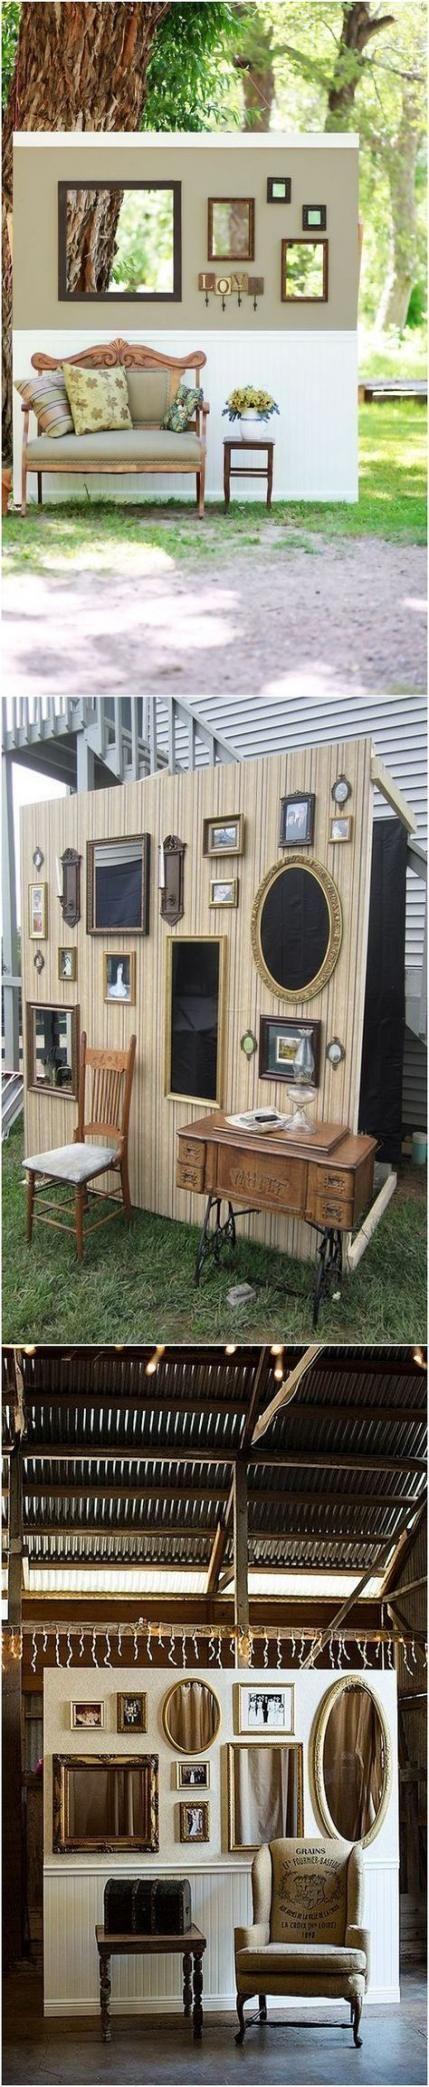 42+ Ideas For Wedding Ideas Church Photo Booths